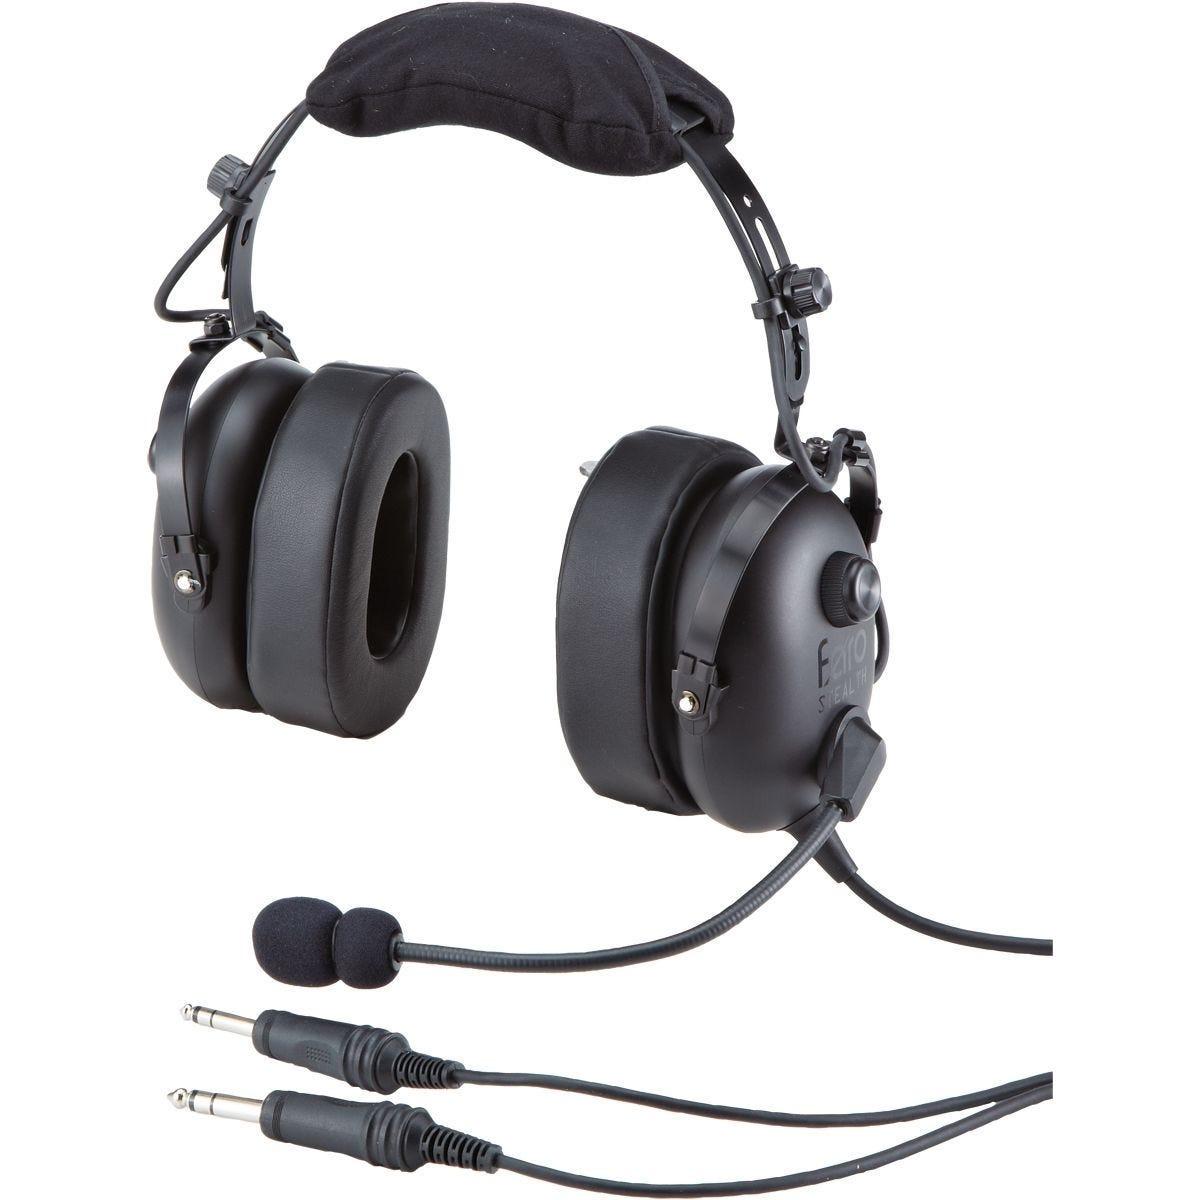 FARO Stealth 2 Passive Headset